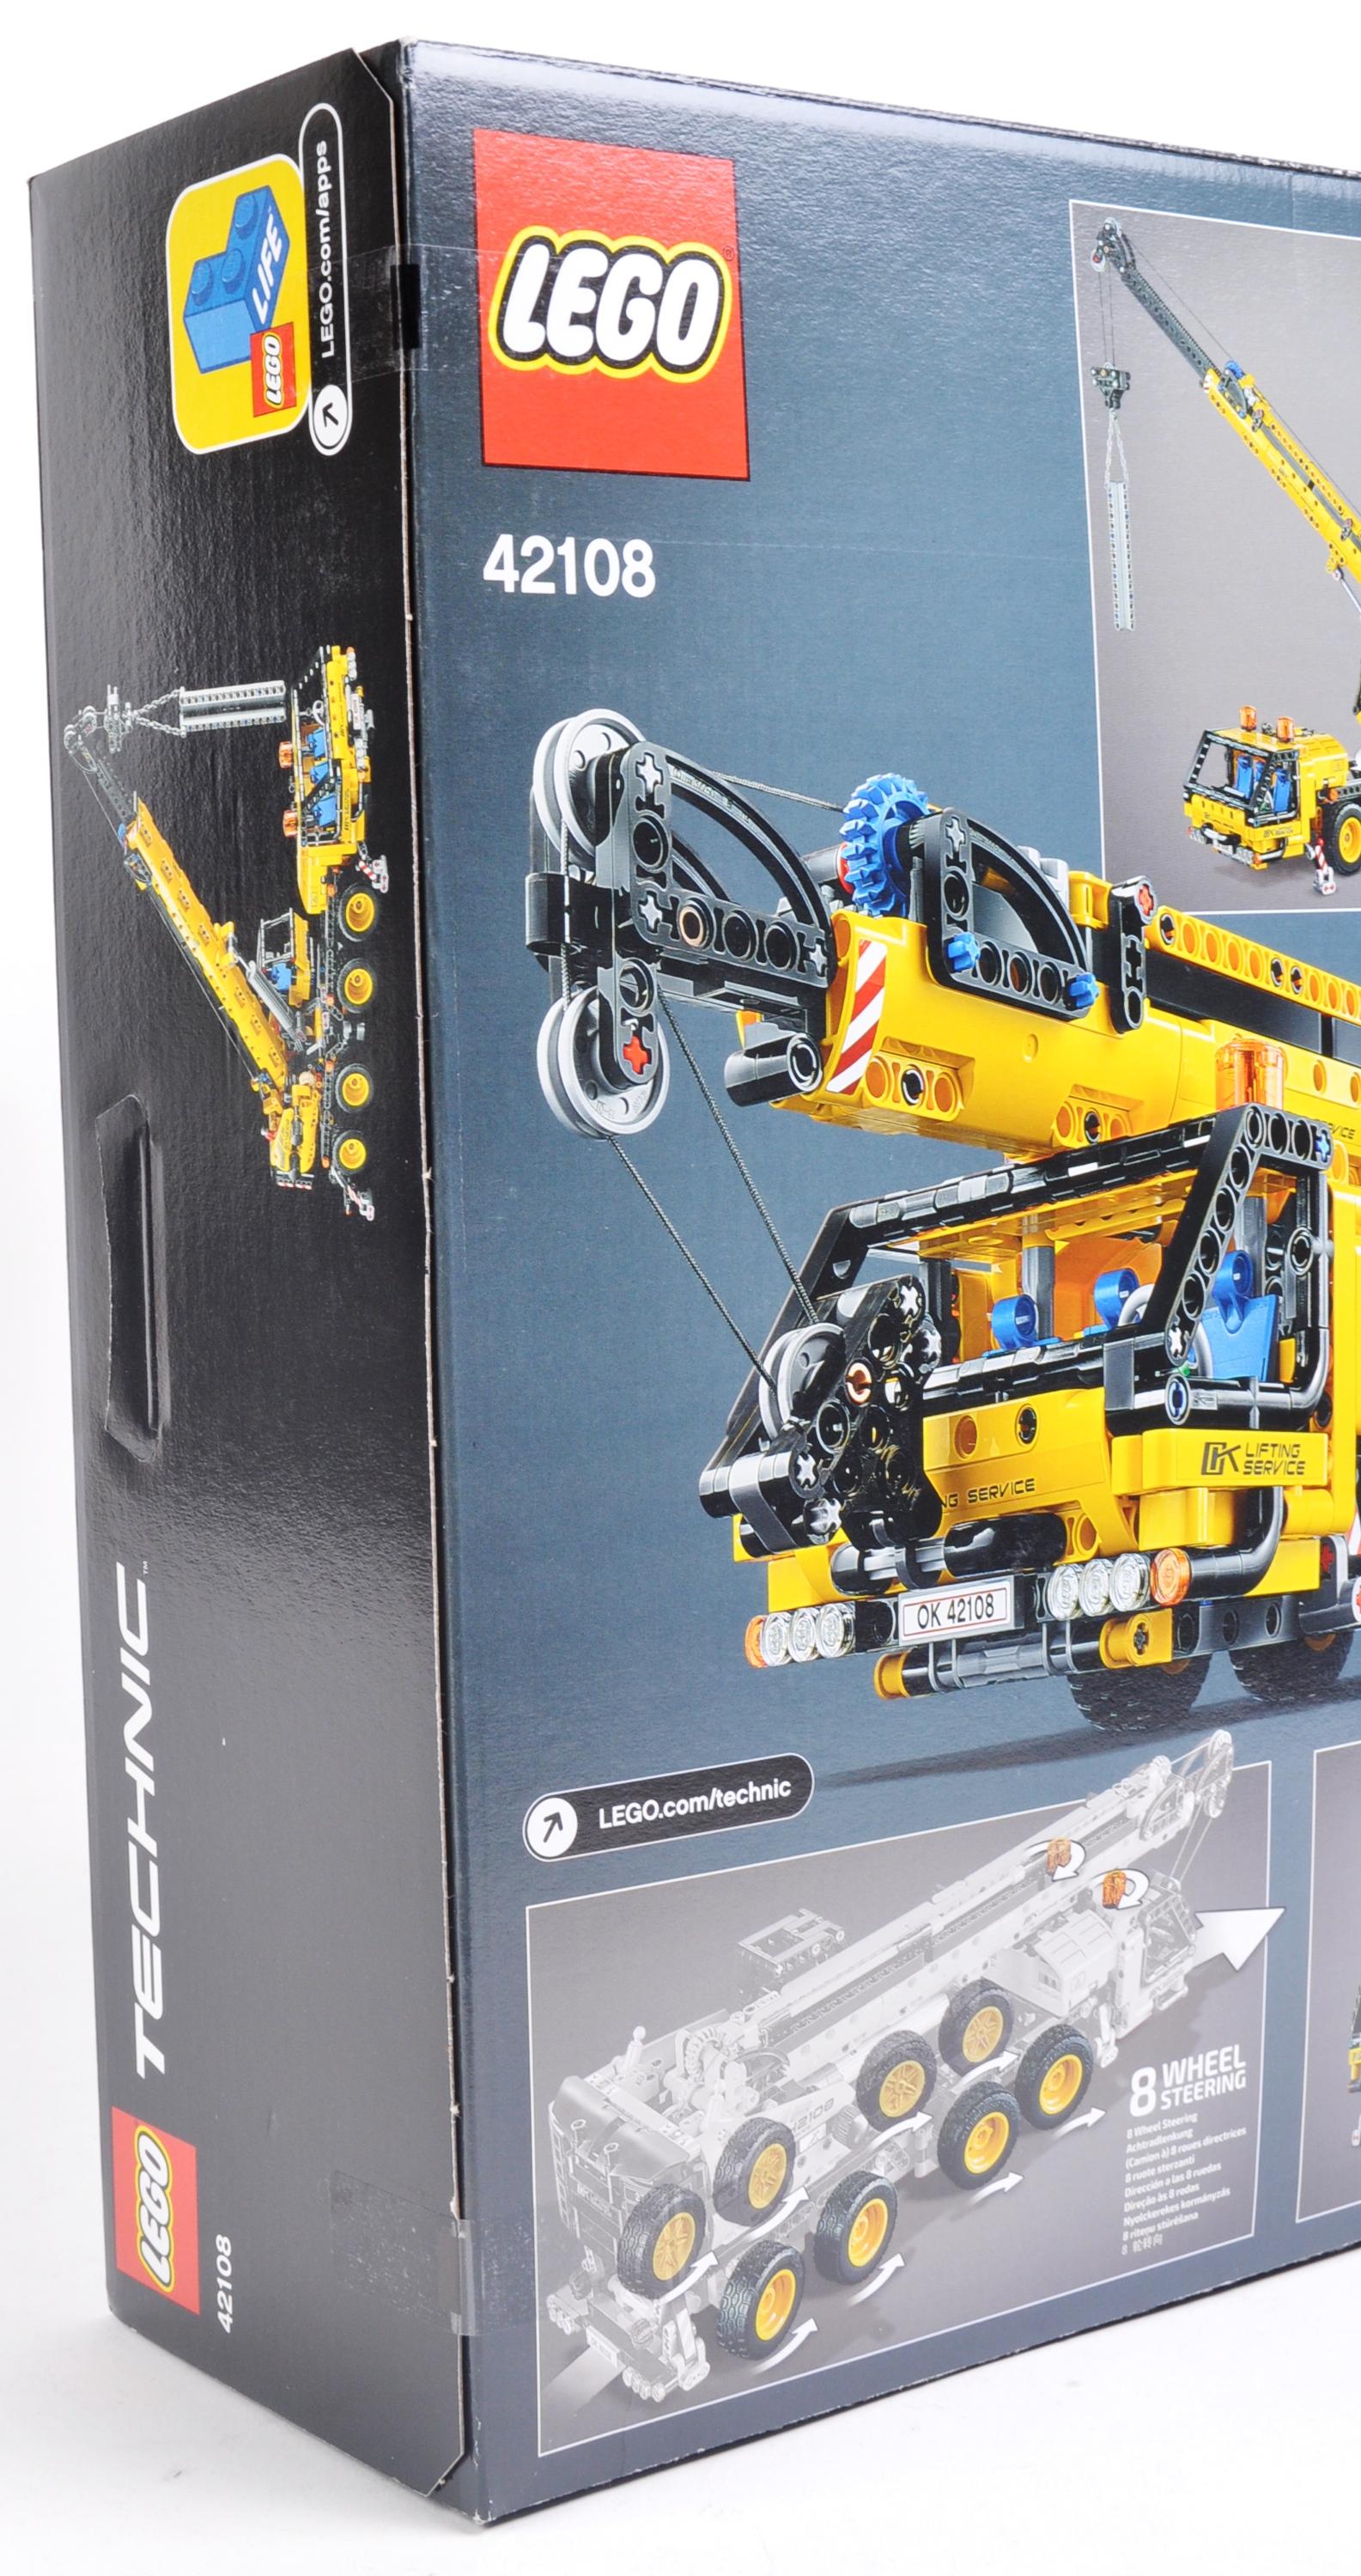 LEGO SET - LEGO TECHNIC - 42108 - MOBILE CRANE - Image 4 of 4